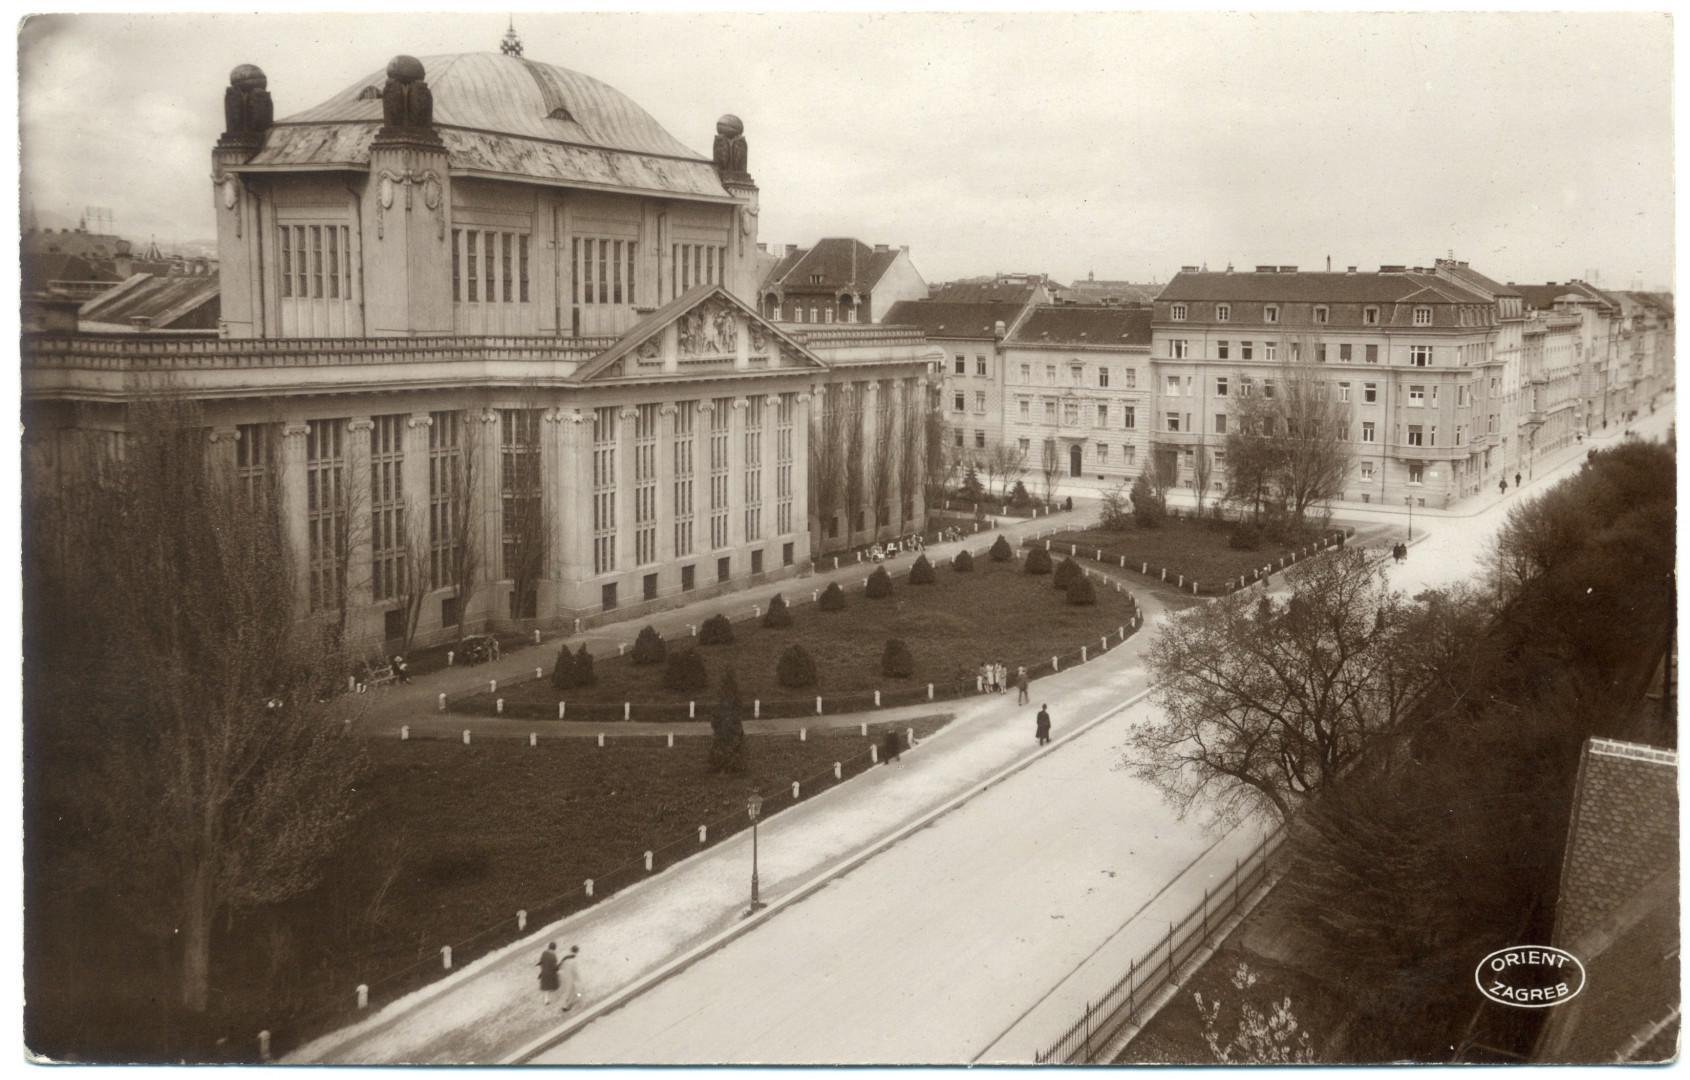 Zagreb: National- und Universitätsbibliothek